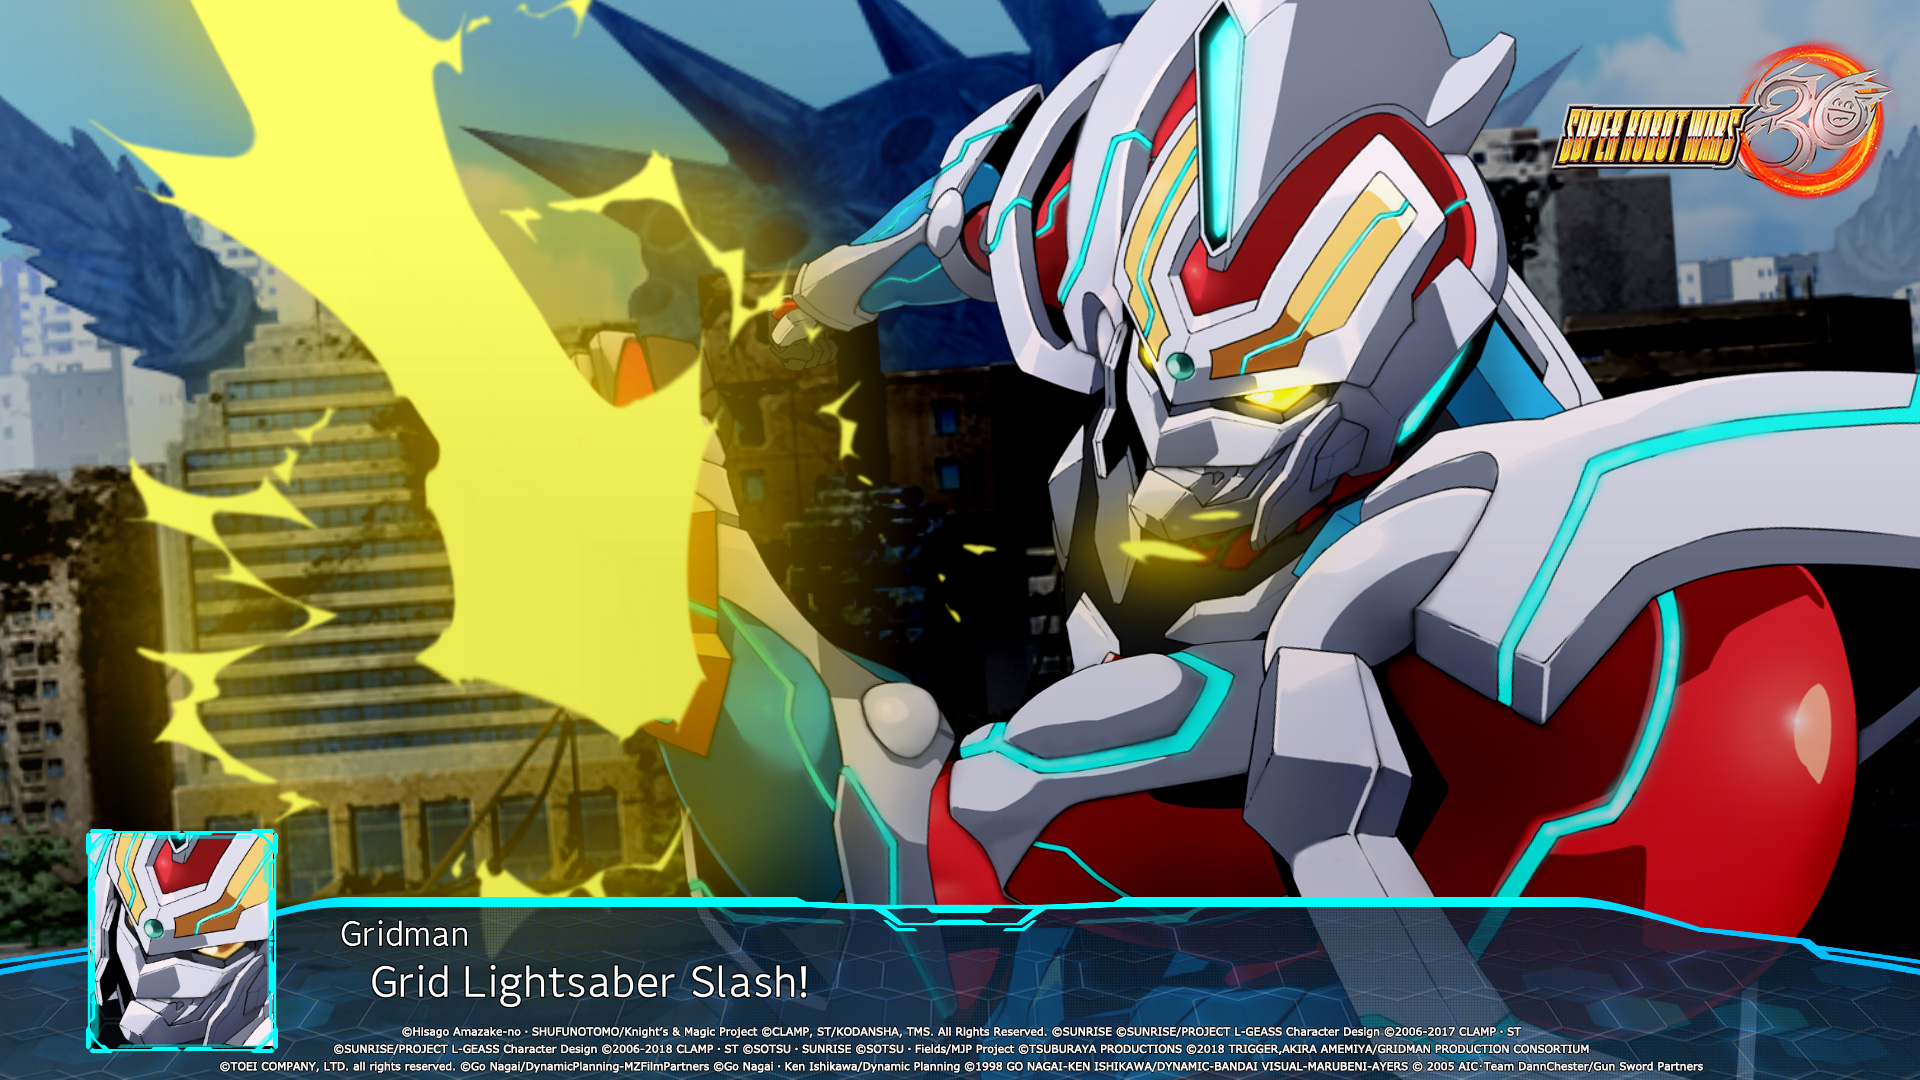 Super Robot Wars 30 Screenshot of a large mecha named Gridman attacking with a lightsaber.